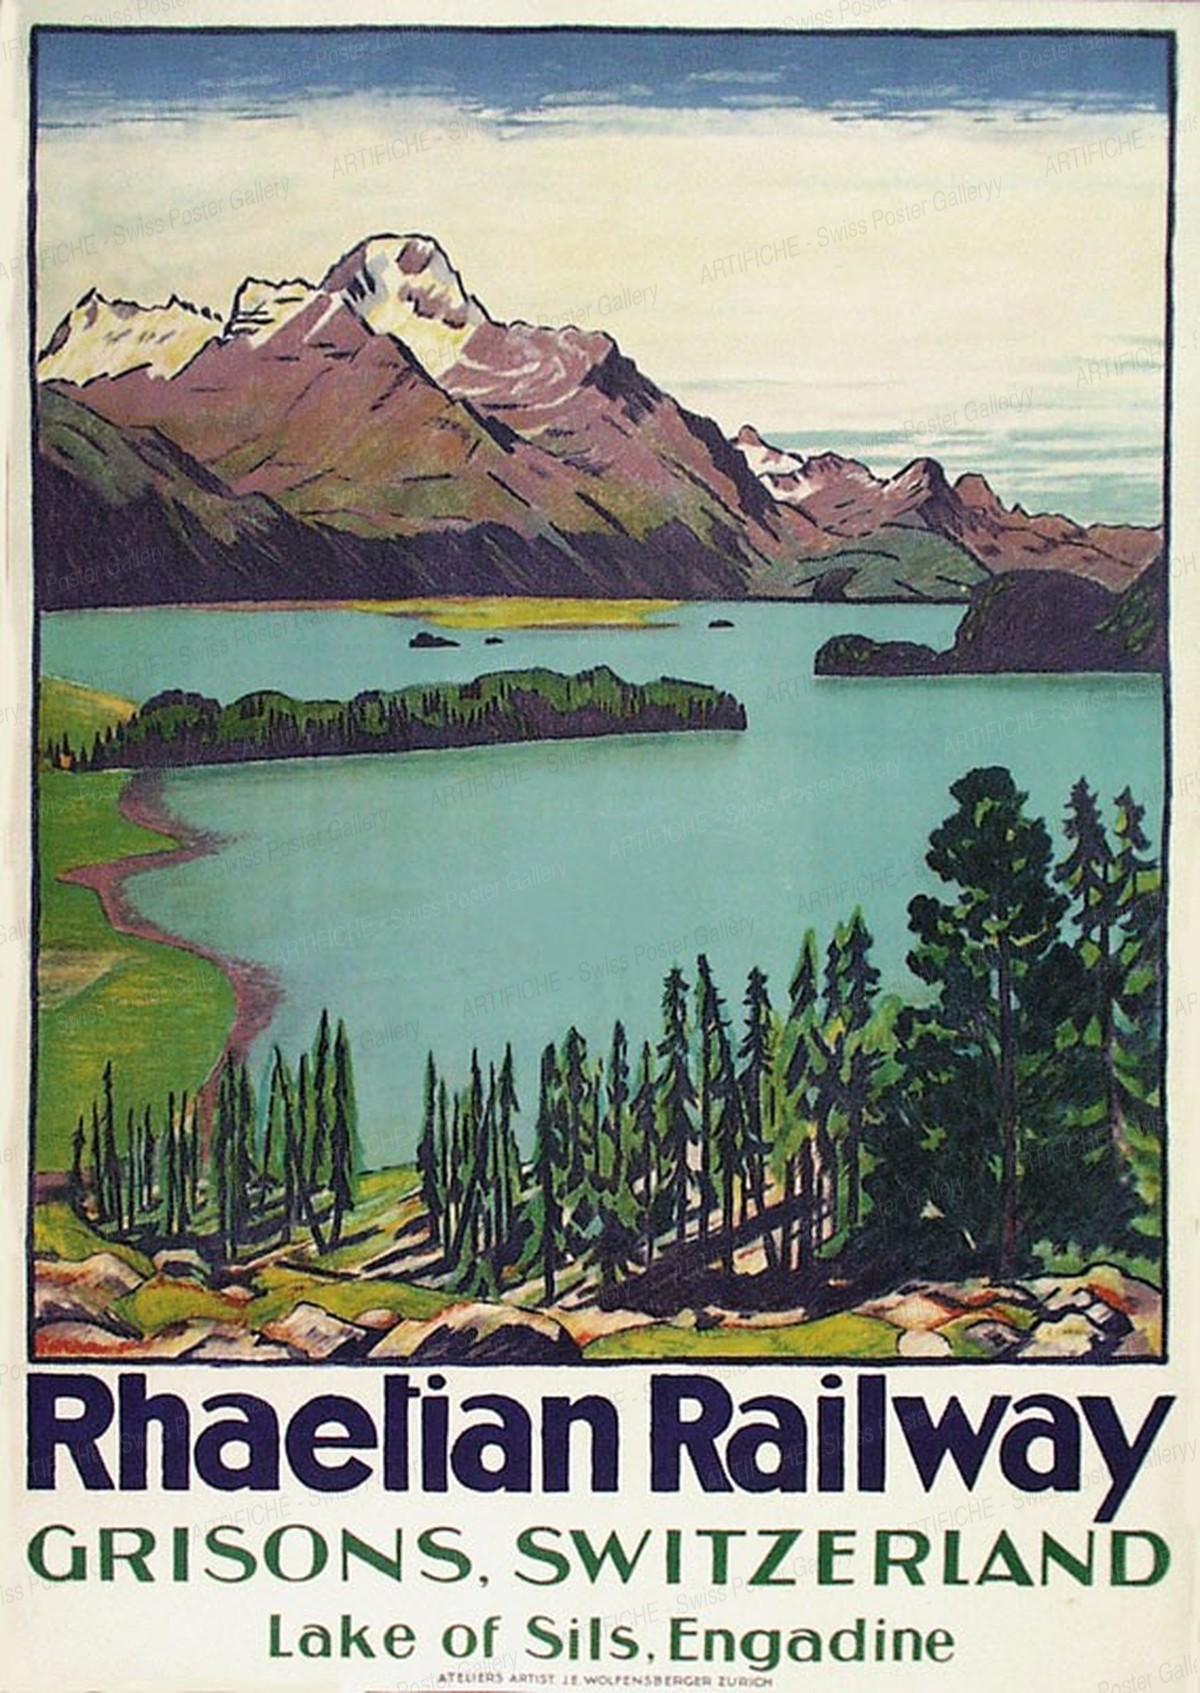 Rhaetian Railway – GRISONS, SWITZERLAND – Lake of Sils, Engadine, Emil Cardinaux